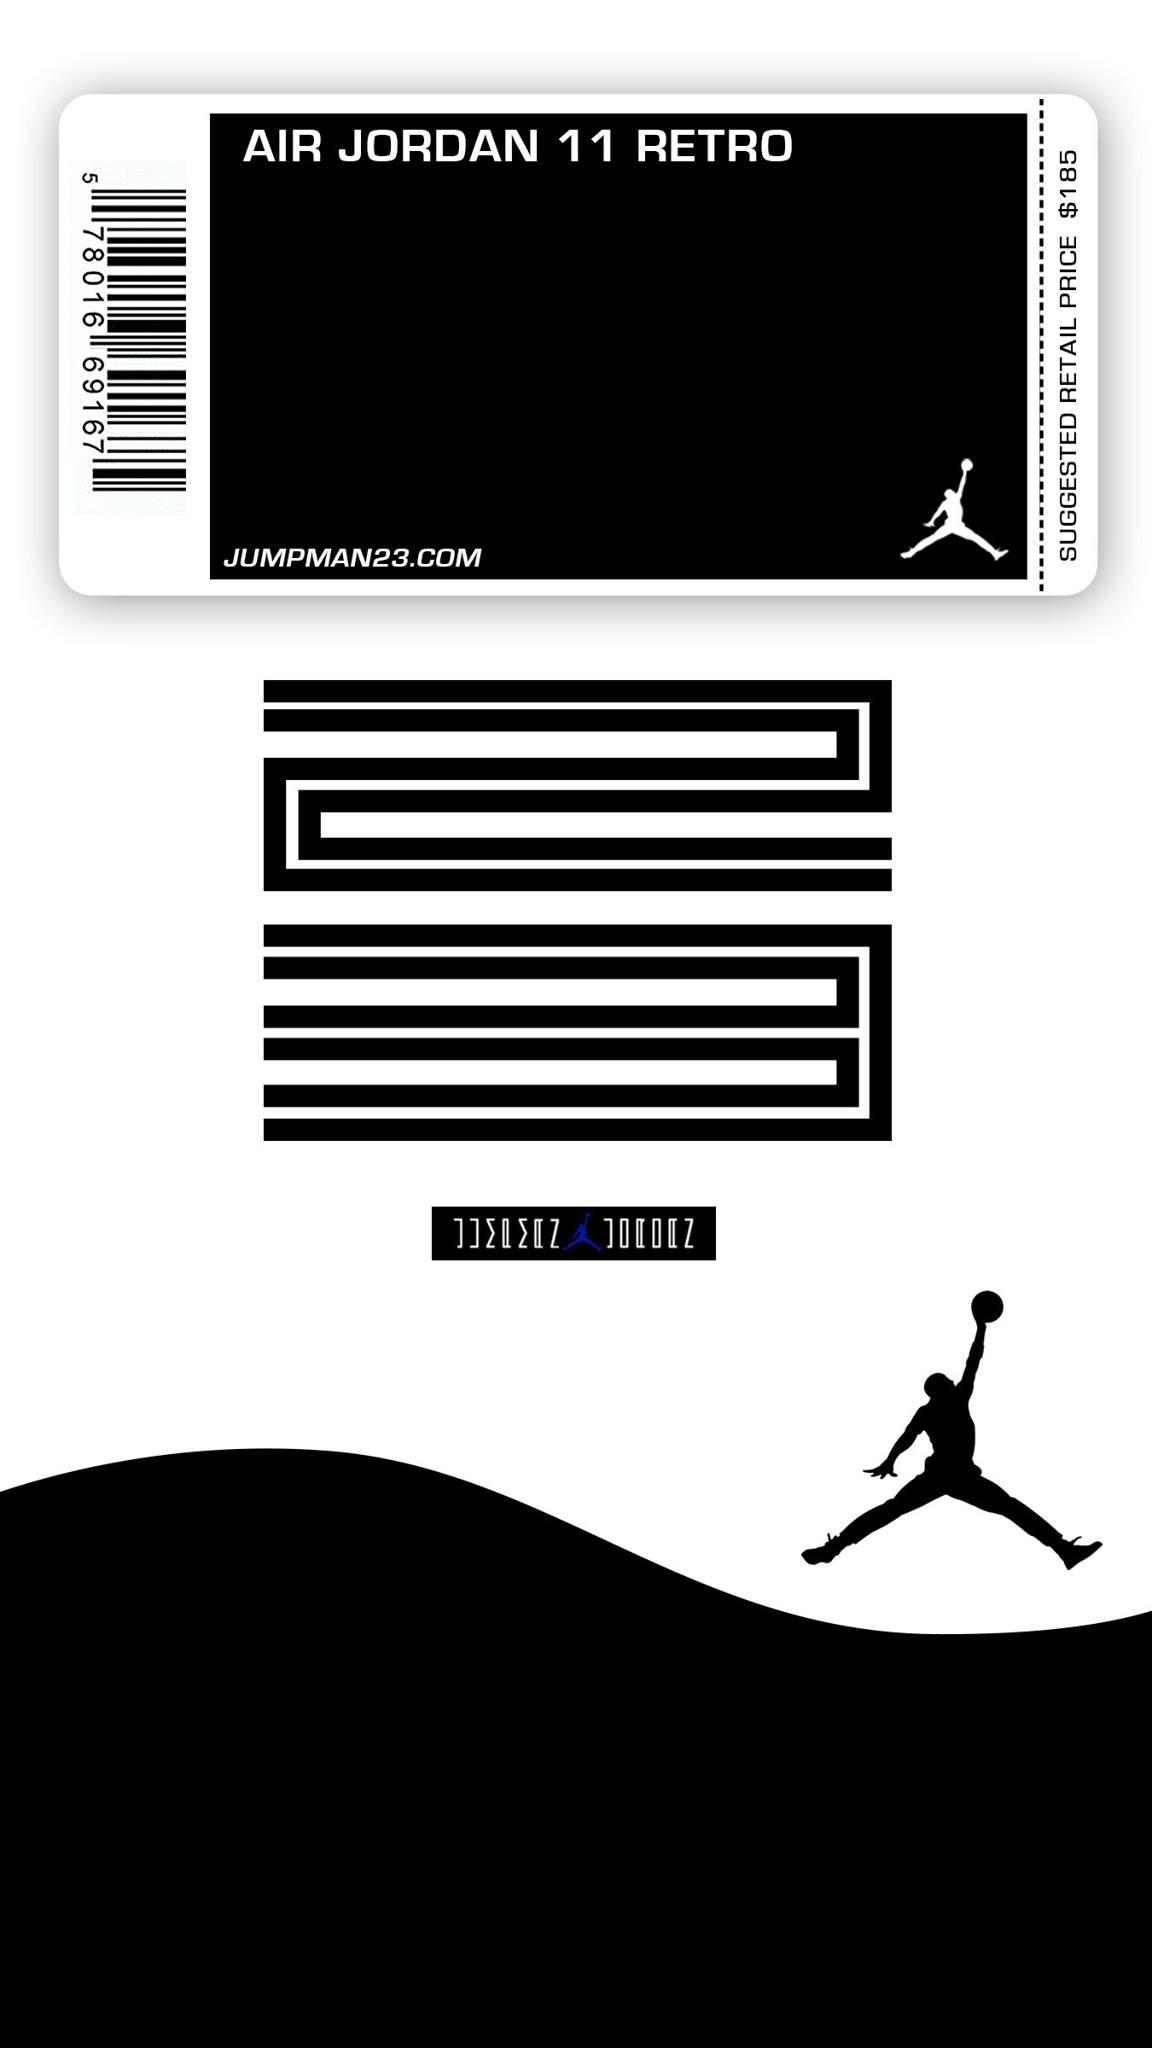 Jordan iPhone Wallpaper HD 74 images 1152x2048